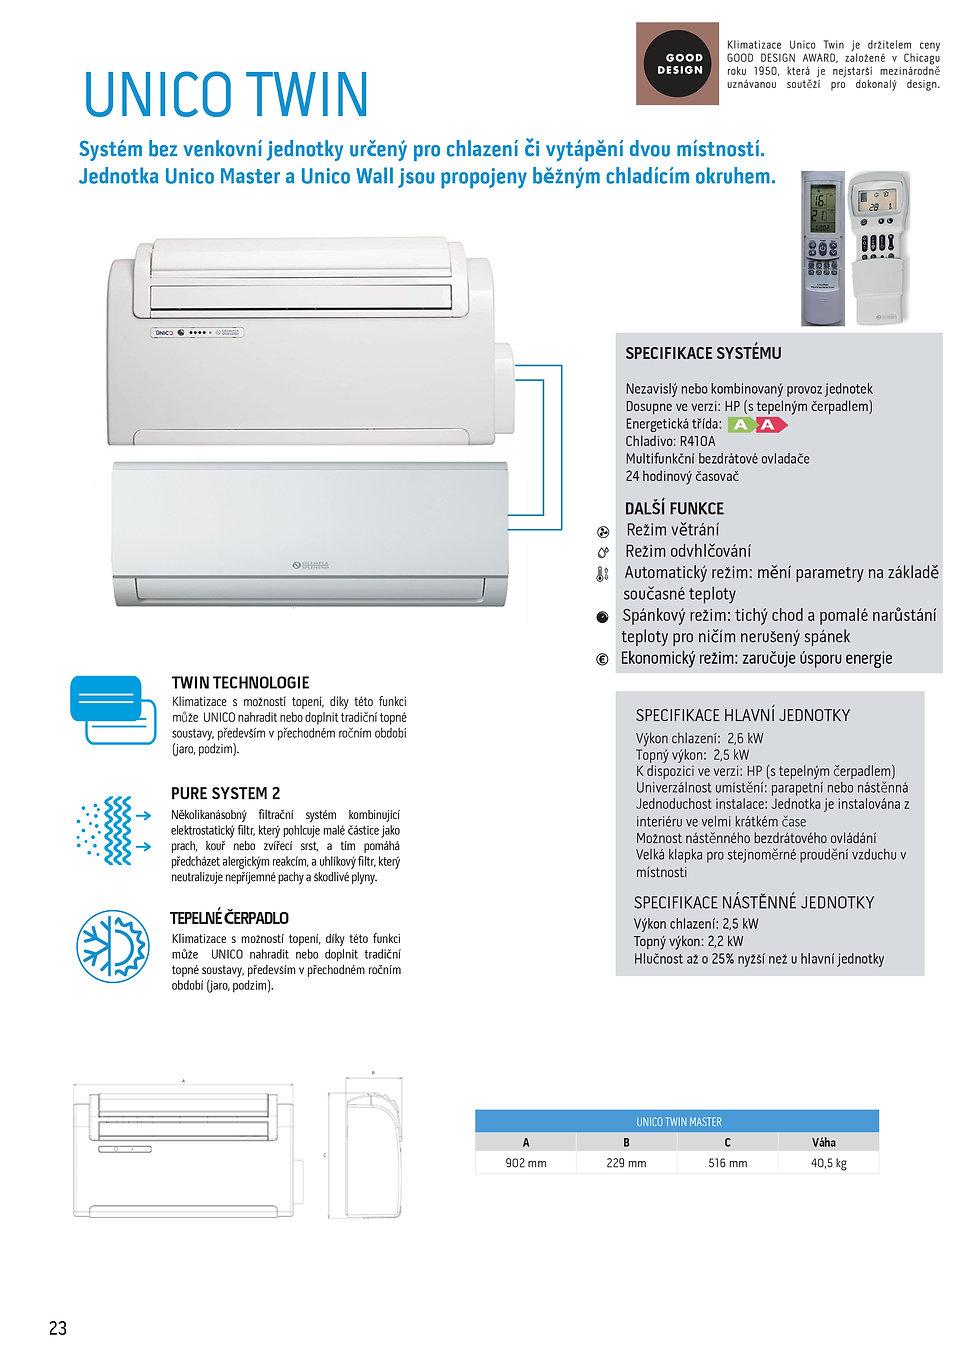 Katalog Unico 2021 Tradesam-25.jpg